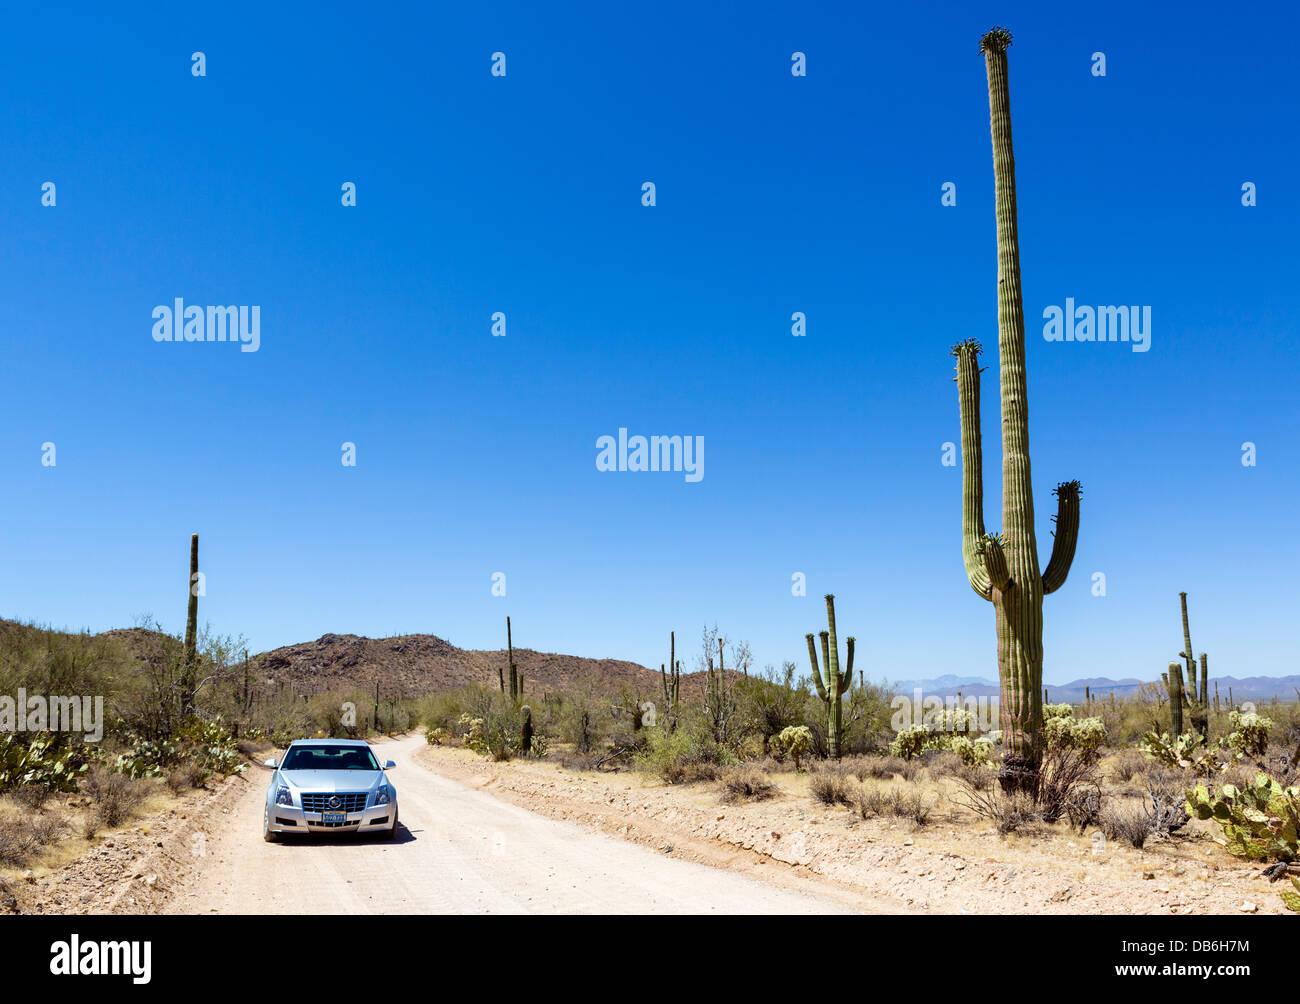 Driving through Saguaro National Park West, Tucson, Arizona, USA - Stock Image